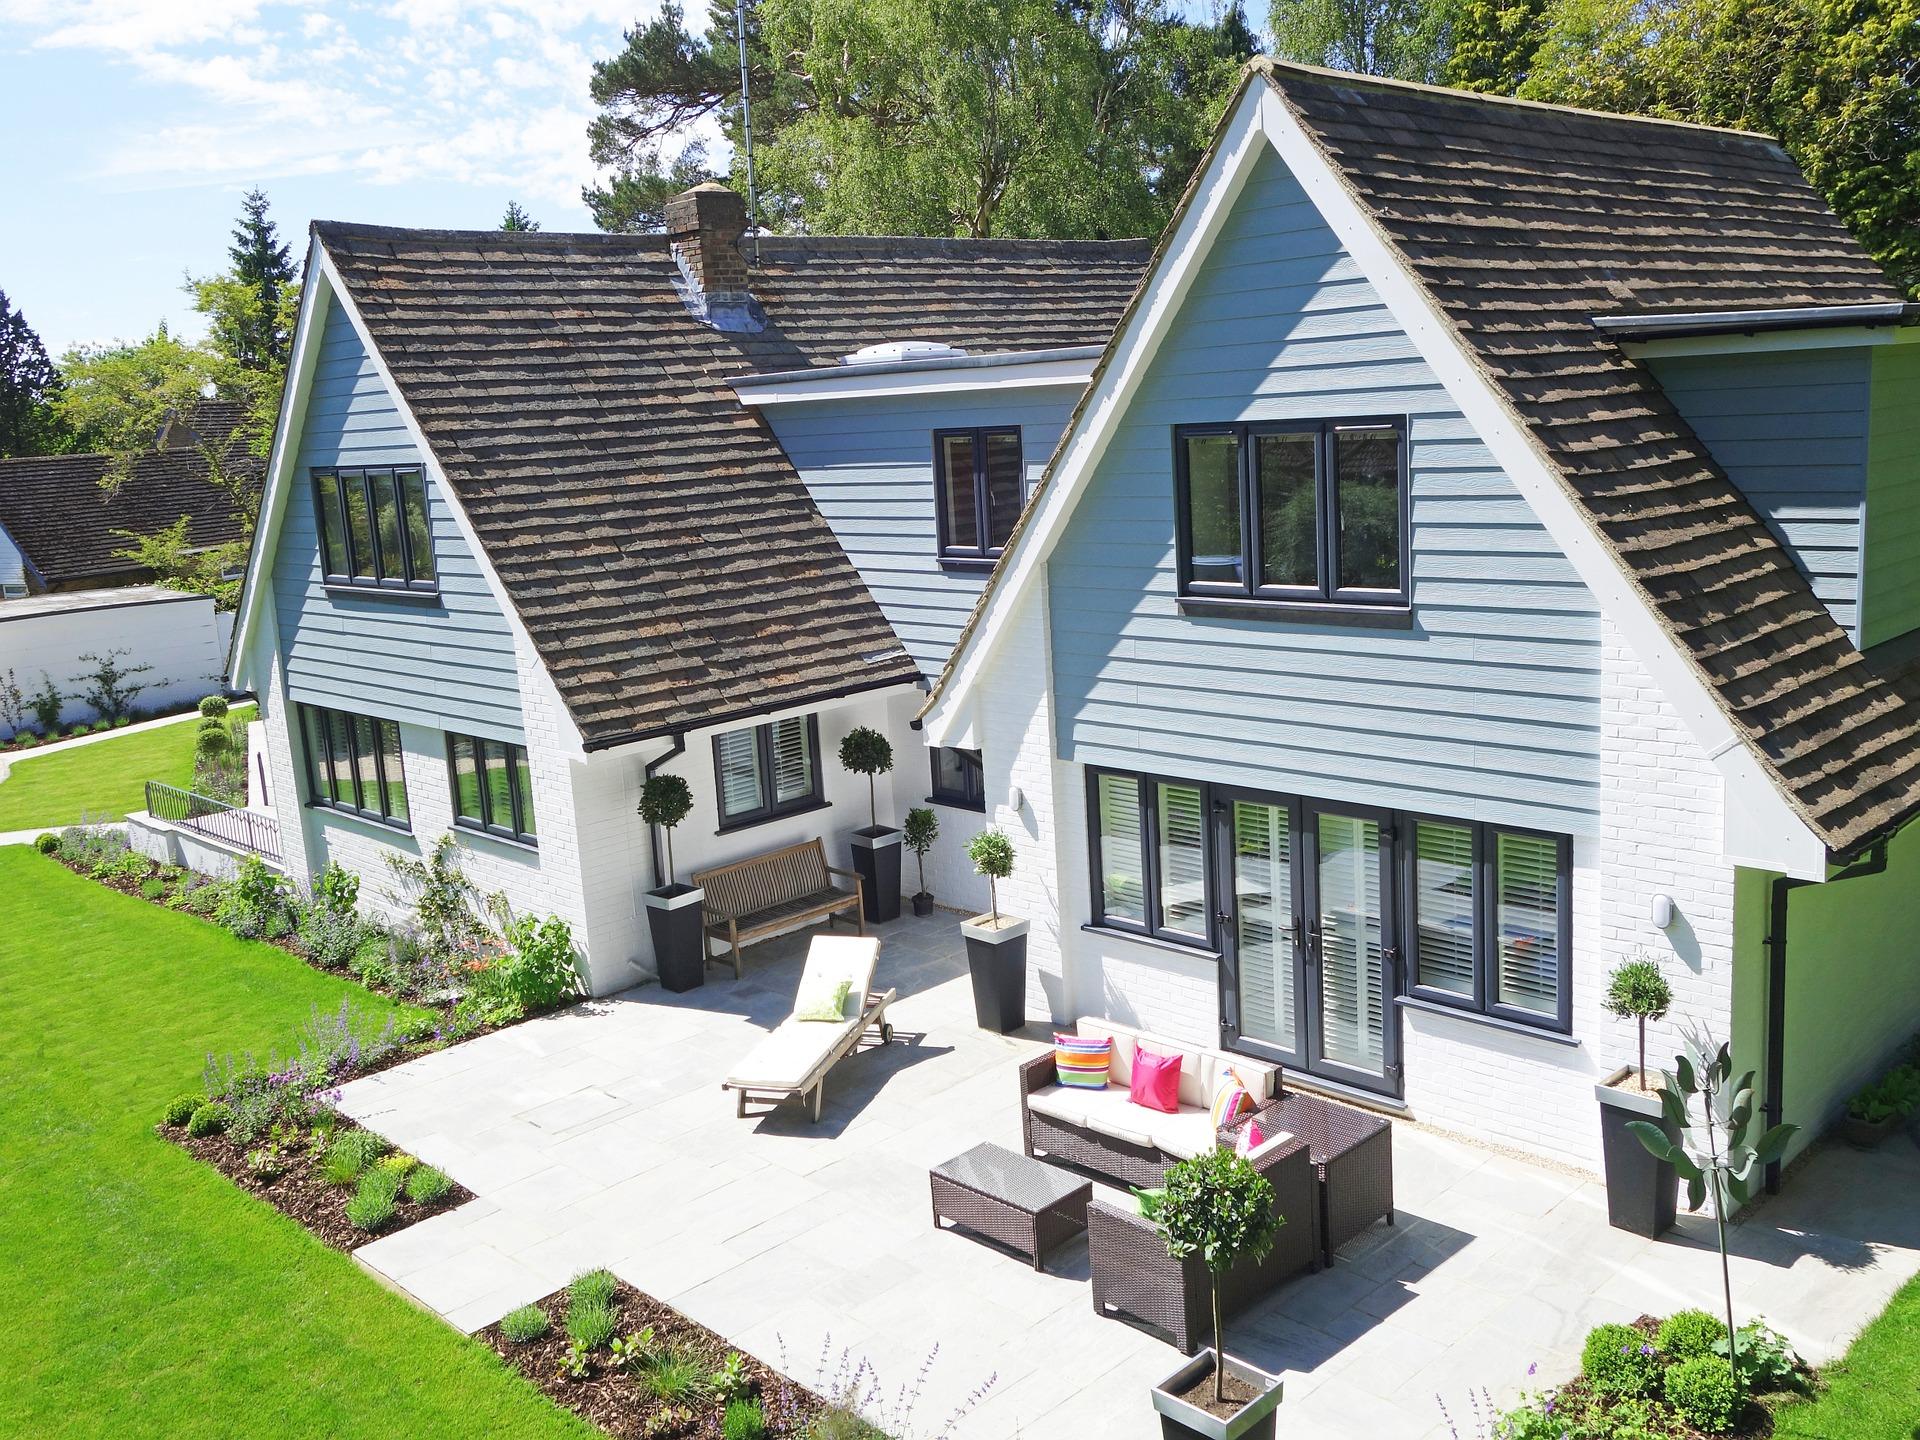 , House and garden jobs, Best Garden, Home And DIY Tips